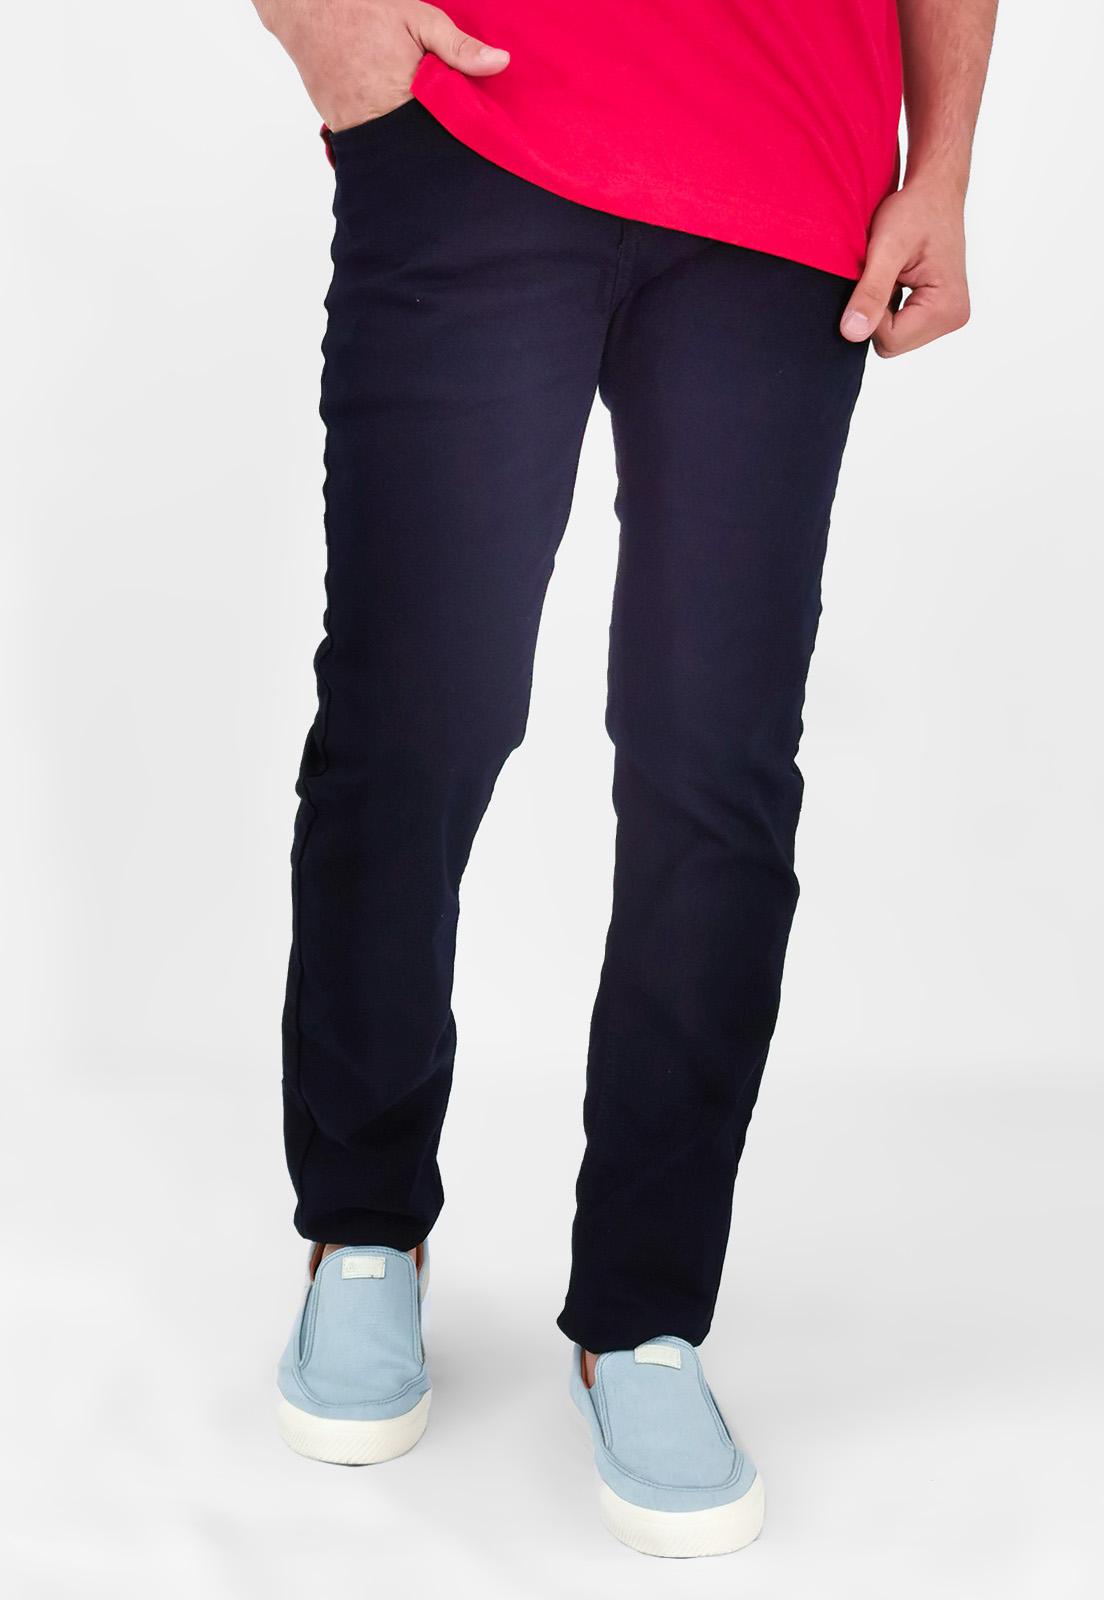 Calça Jeans King & Joe Azul Marinho Skinny